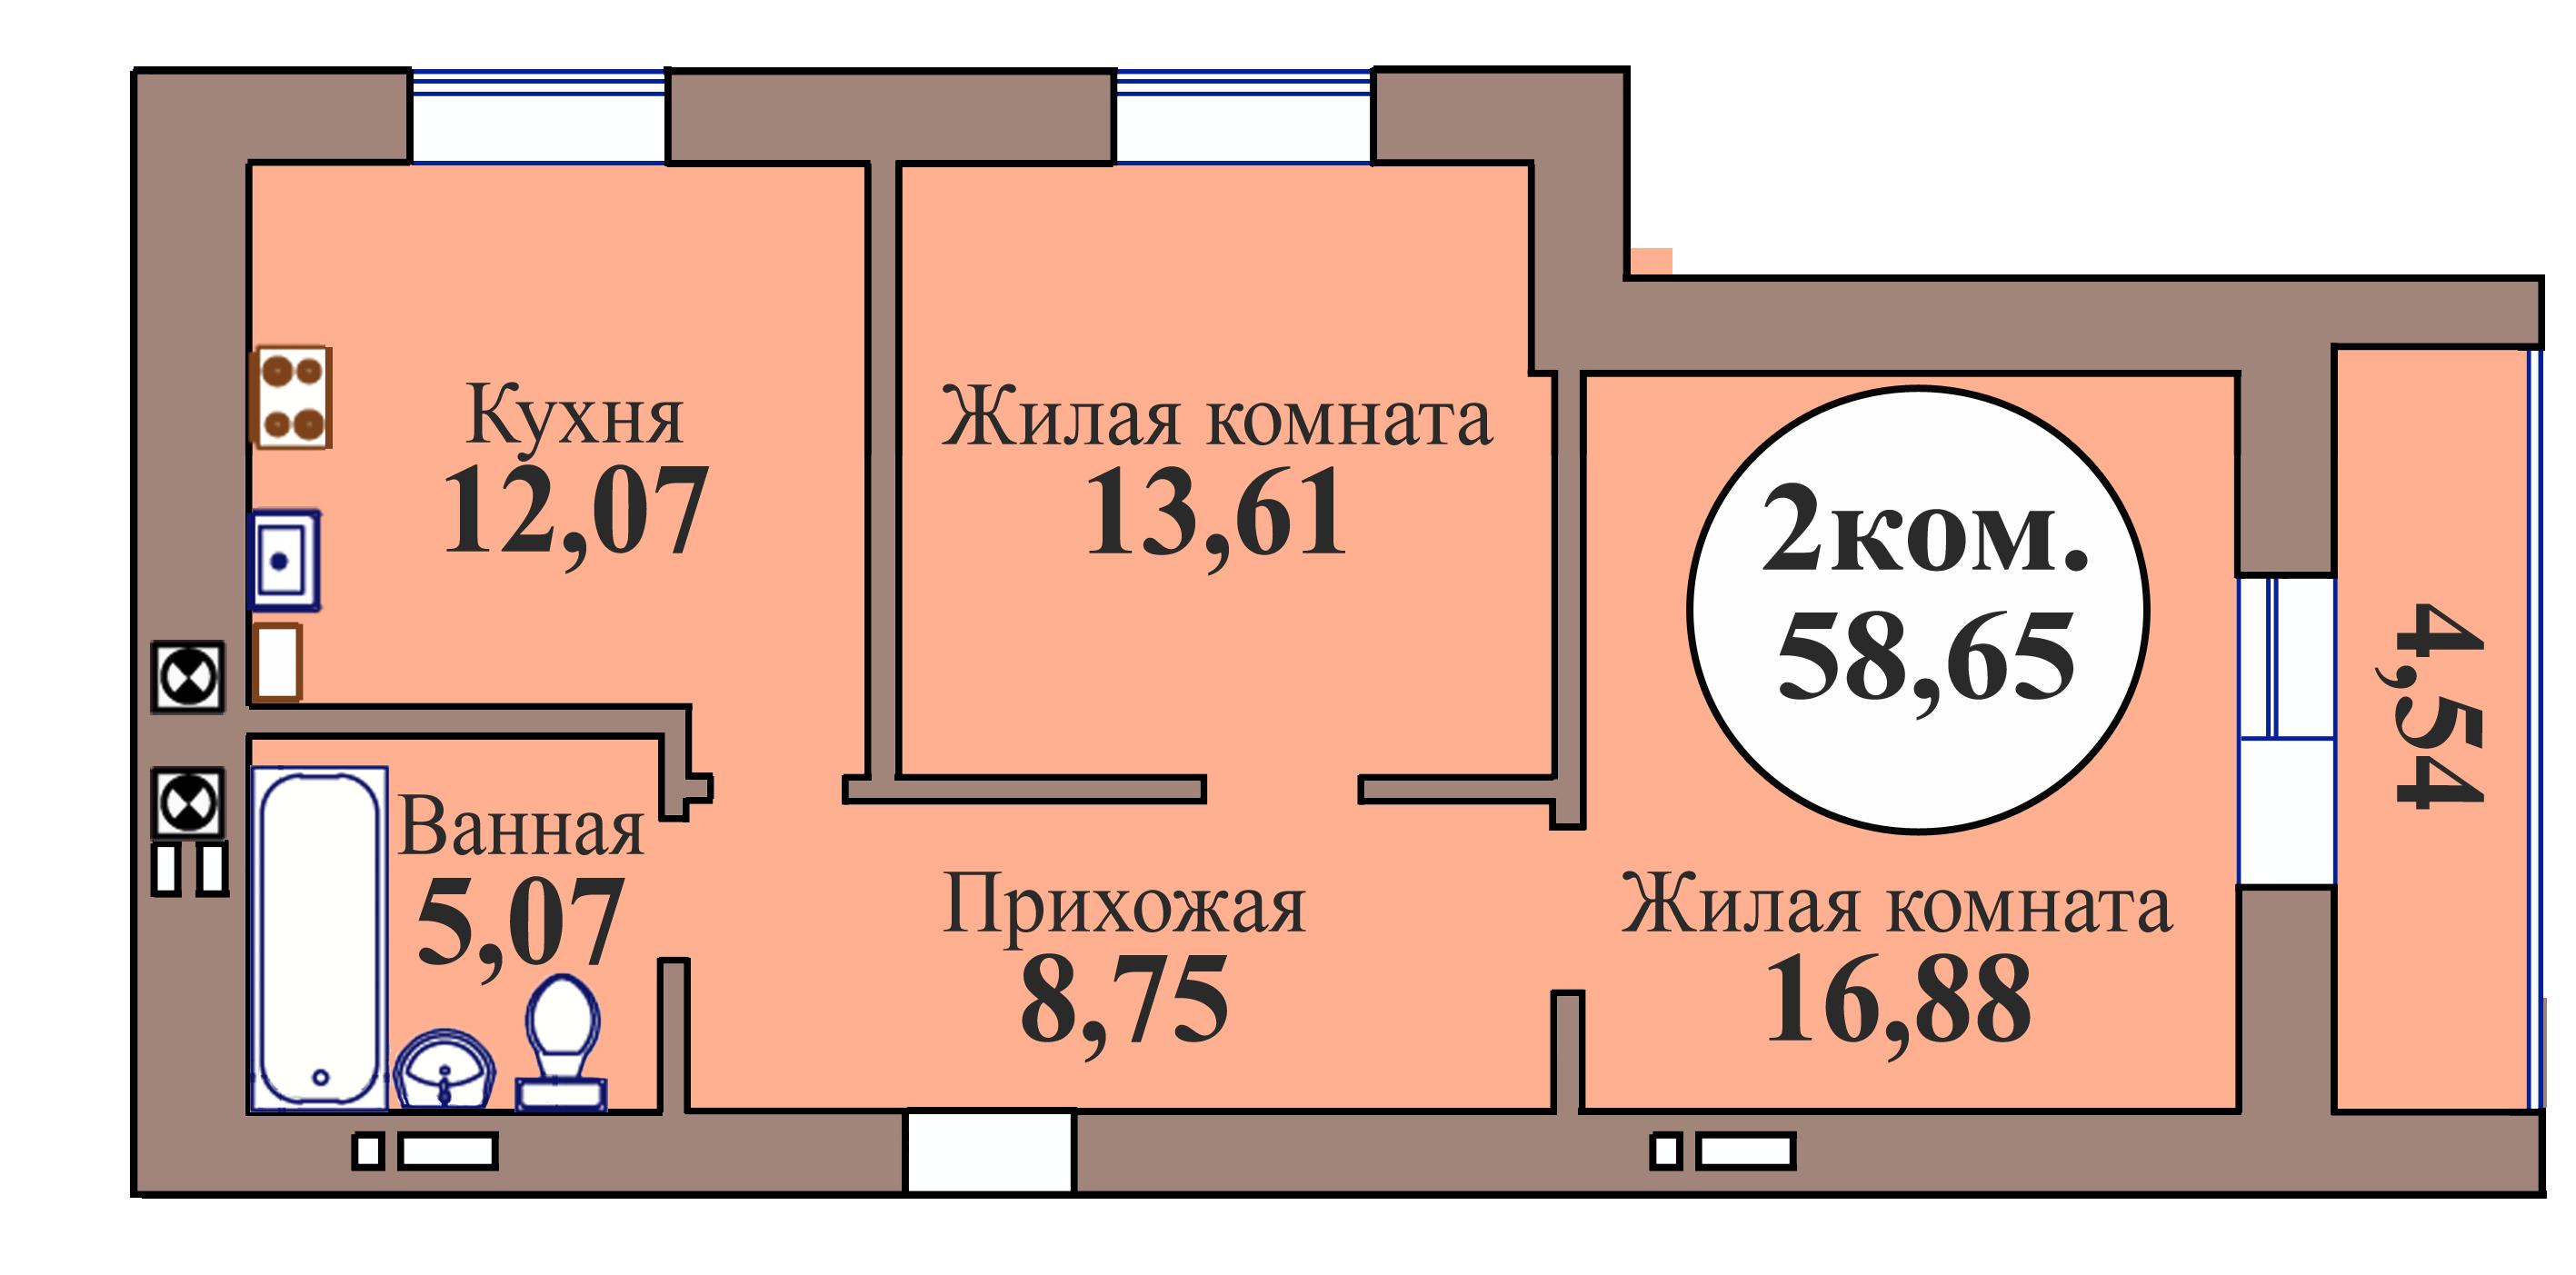 2-комн. кв. по пер. Калининградский, 5 кв. 164 в Калининграде